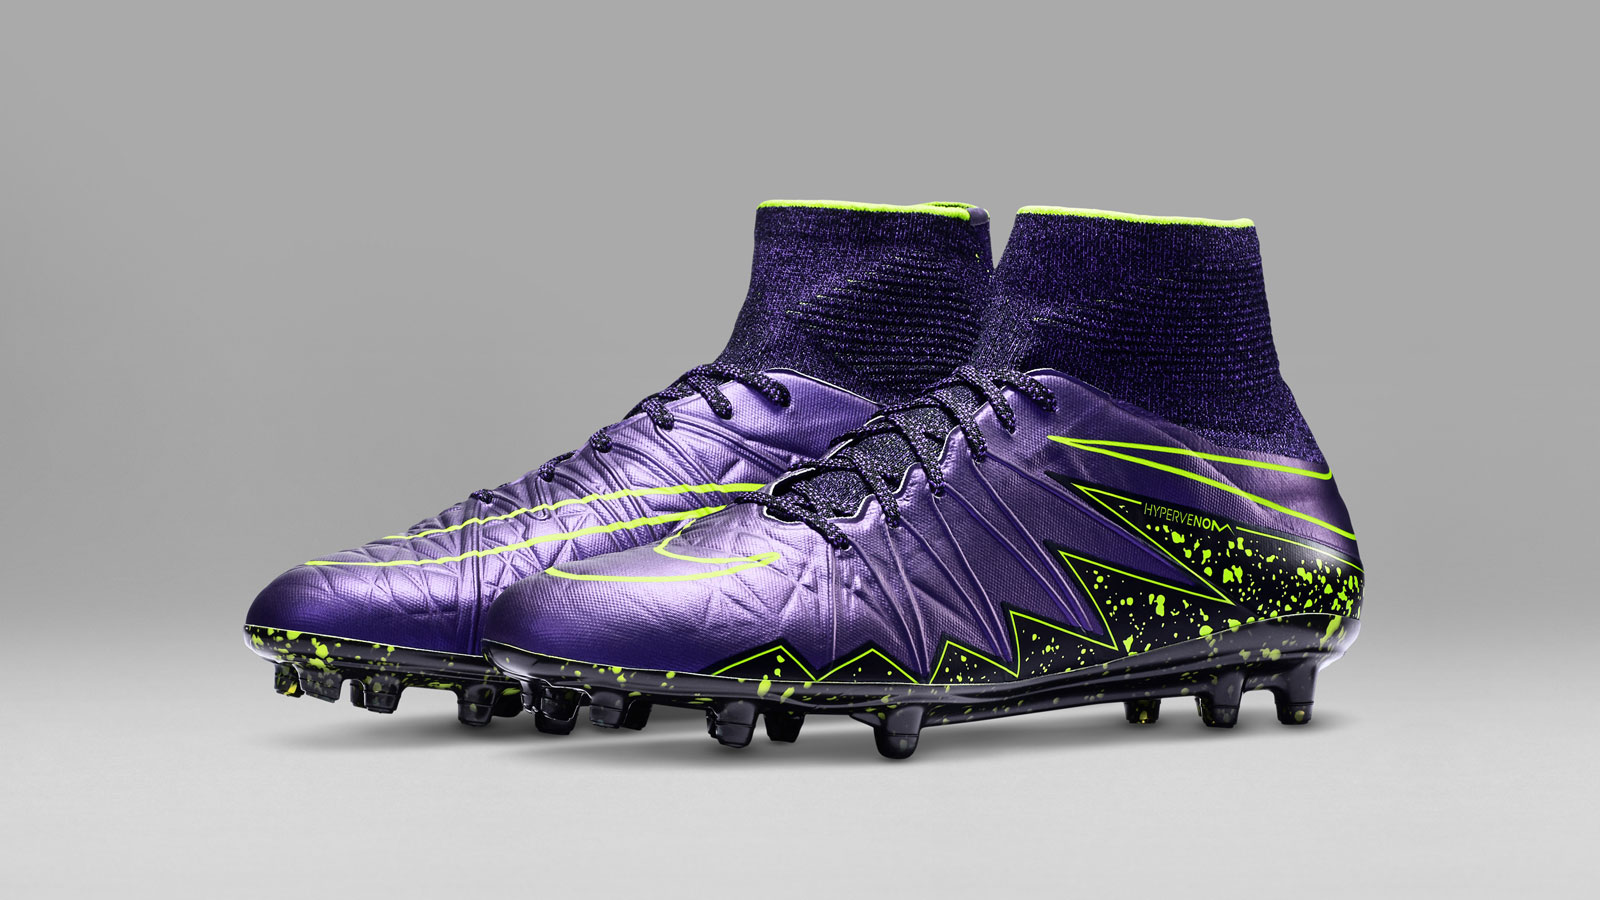 Die Nike Hypervenom Phantom Electro Flare Pack Schuhe